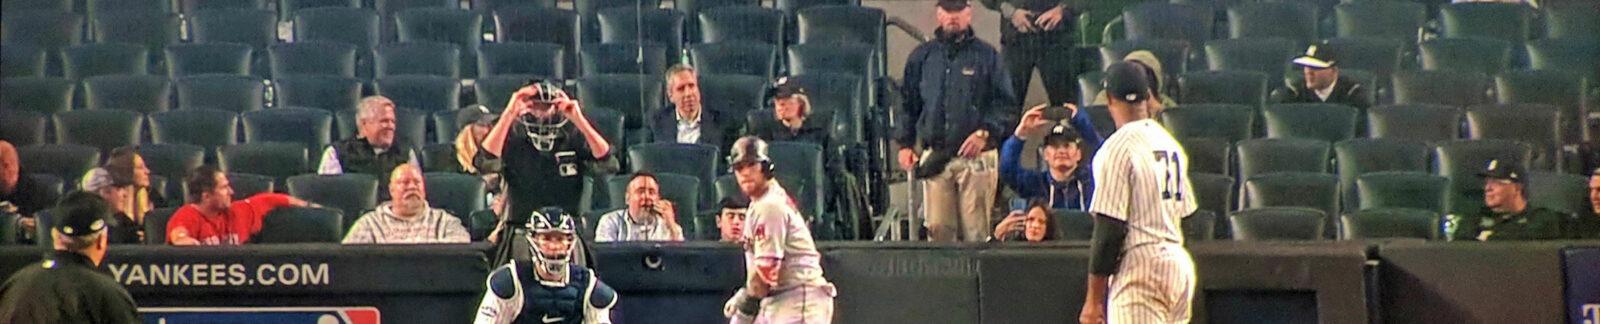 MLB Attendance Decline